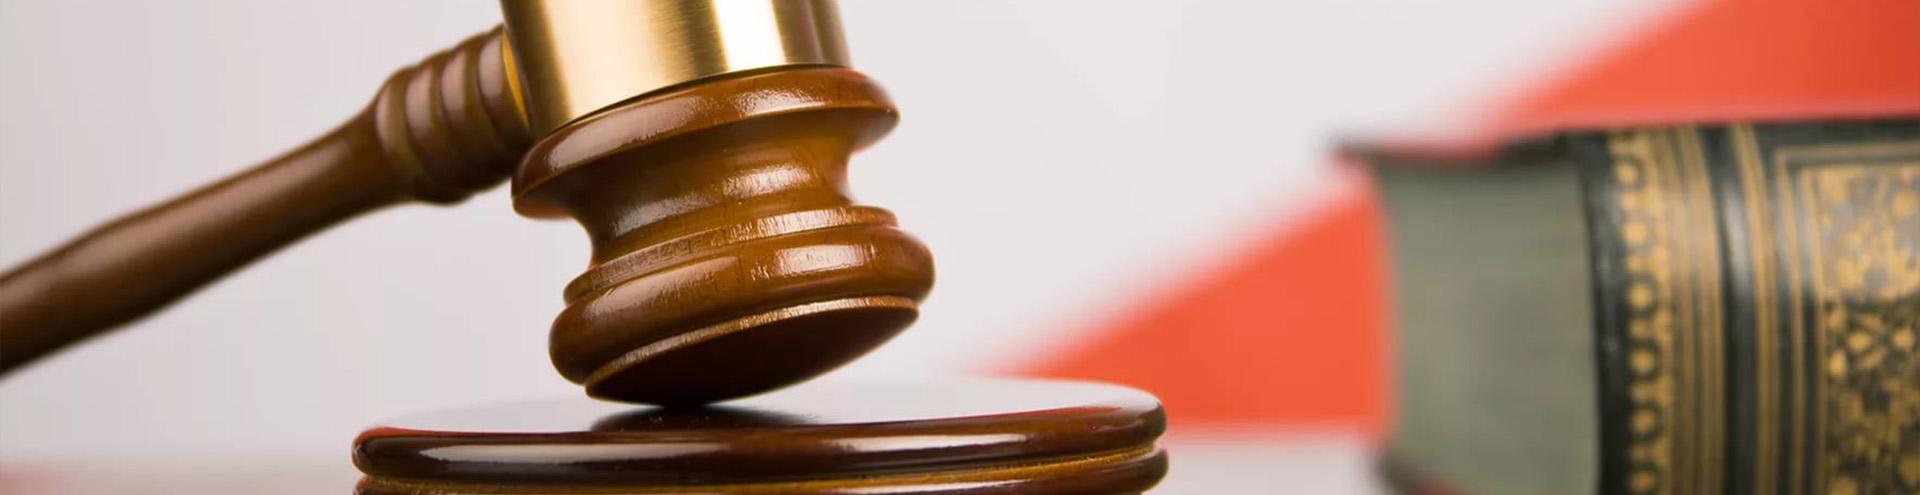 выдача судебного приказа в Самаре и Самарской области